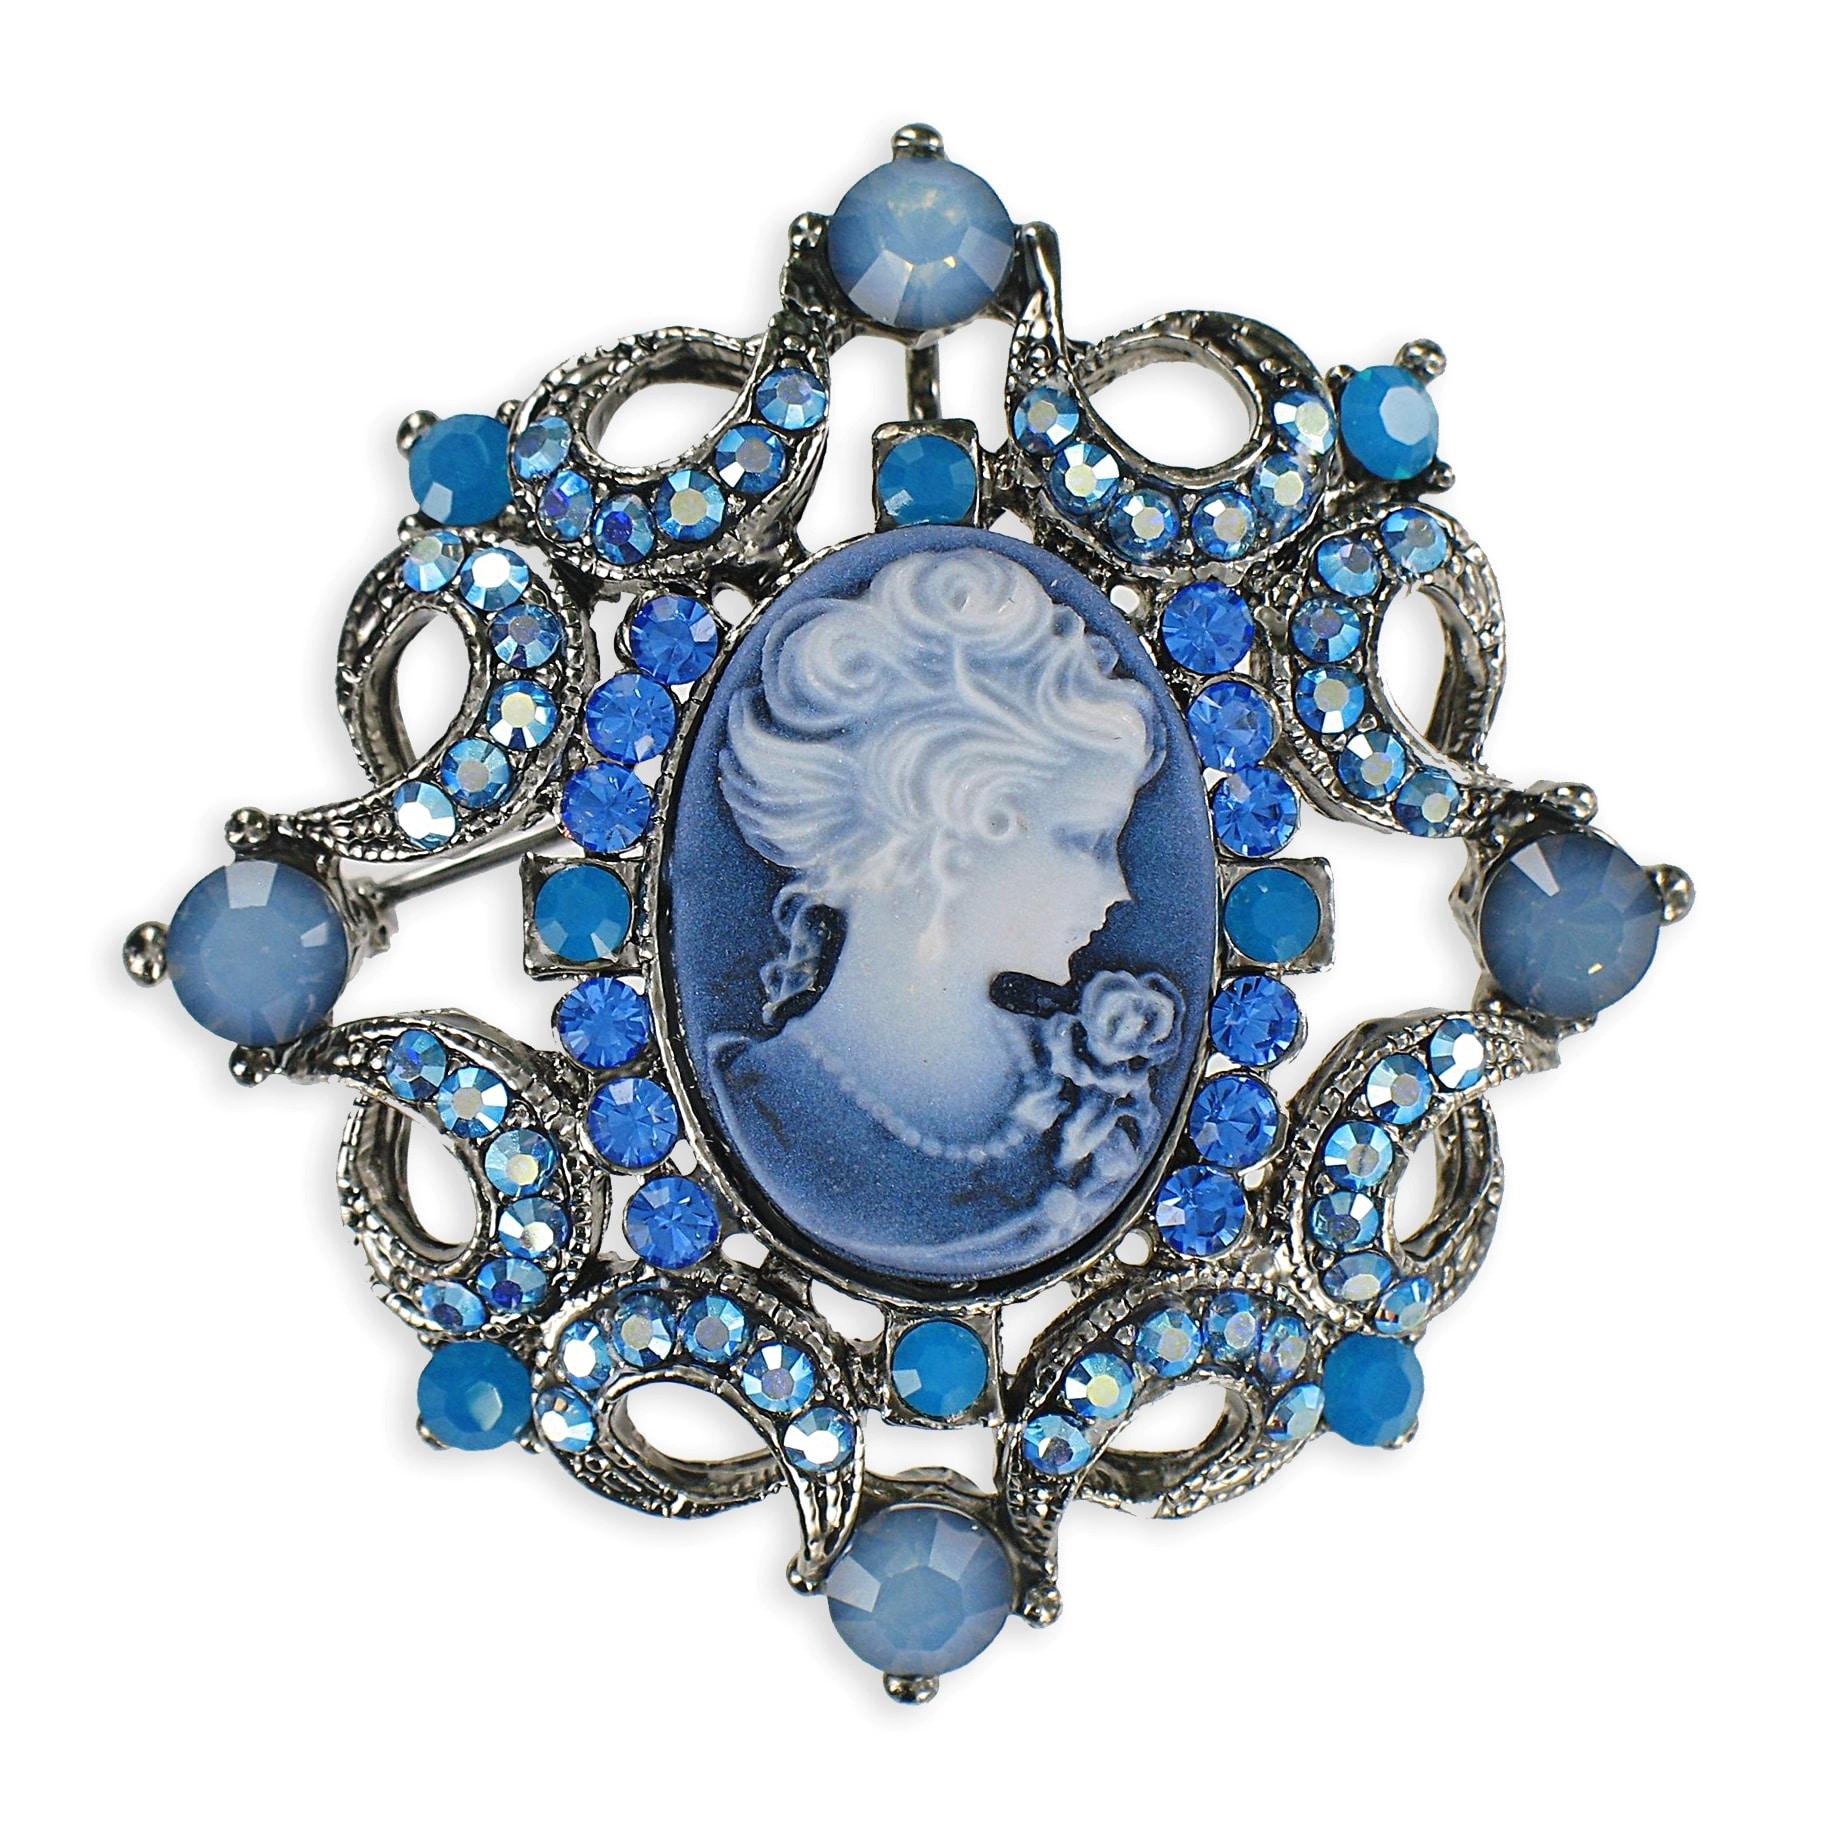 Cano Silvertone Blue Crystal Cameo Brooch